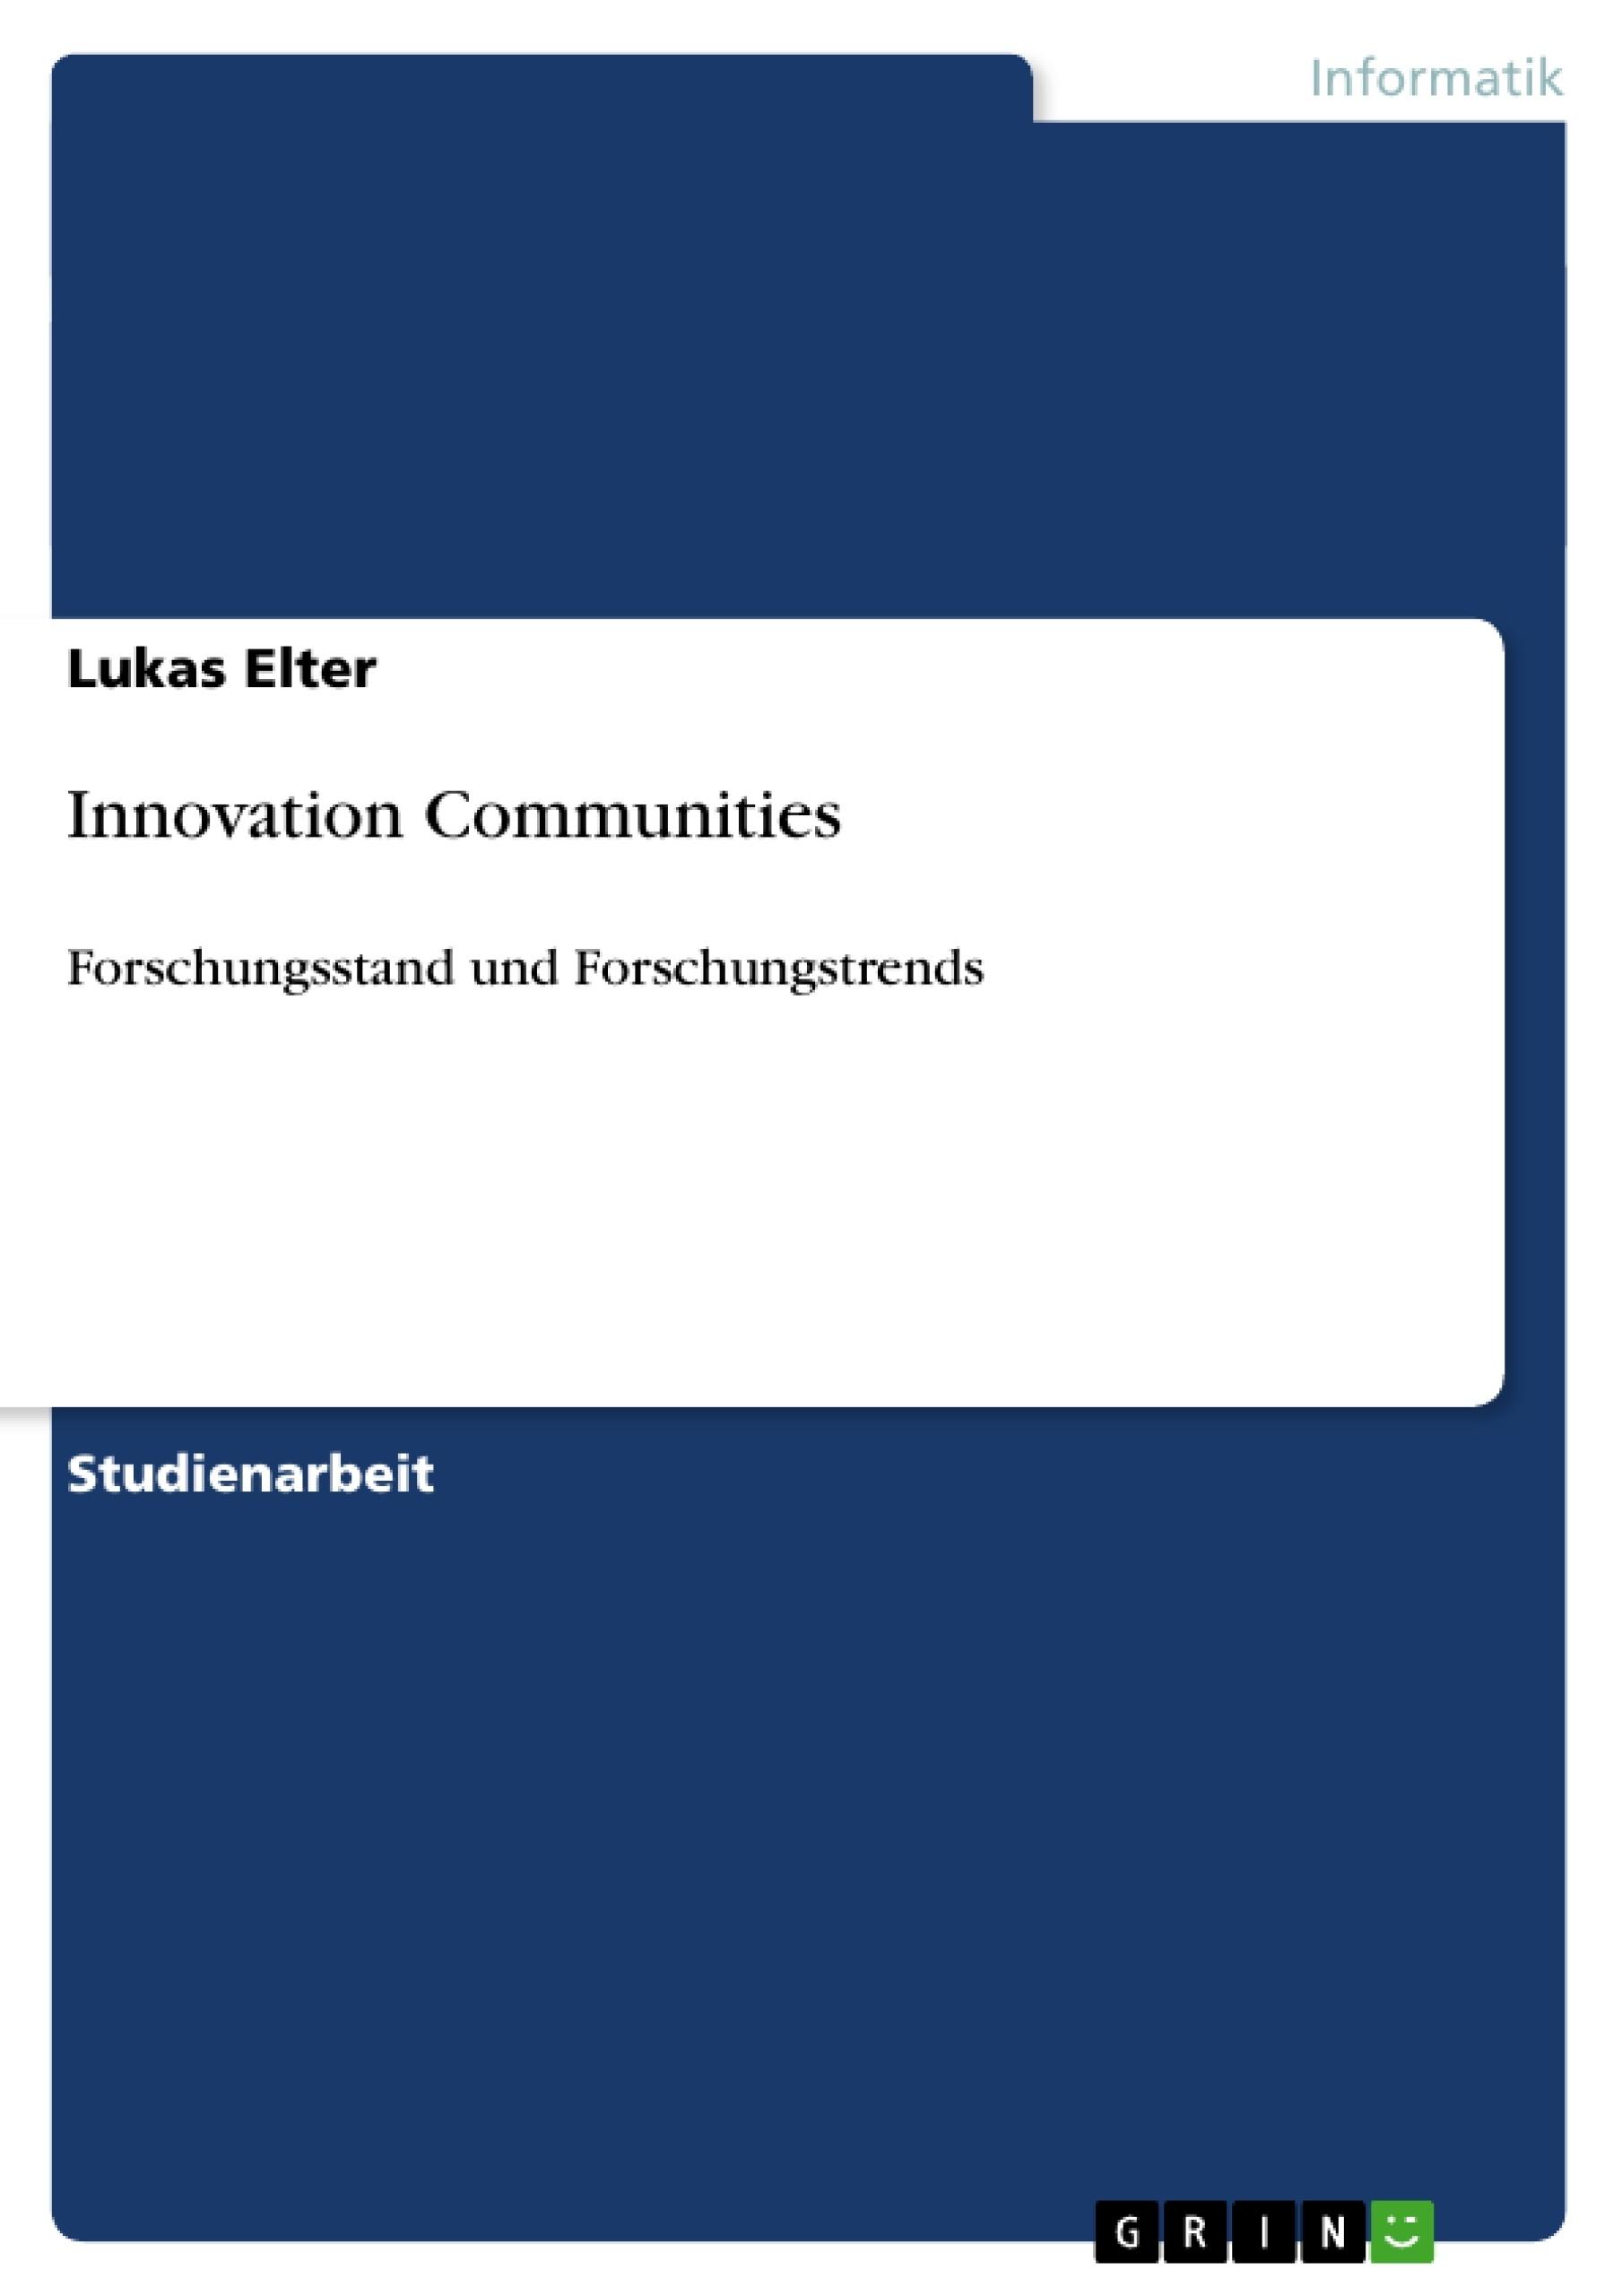 Titel: Innovation Communities